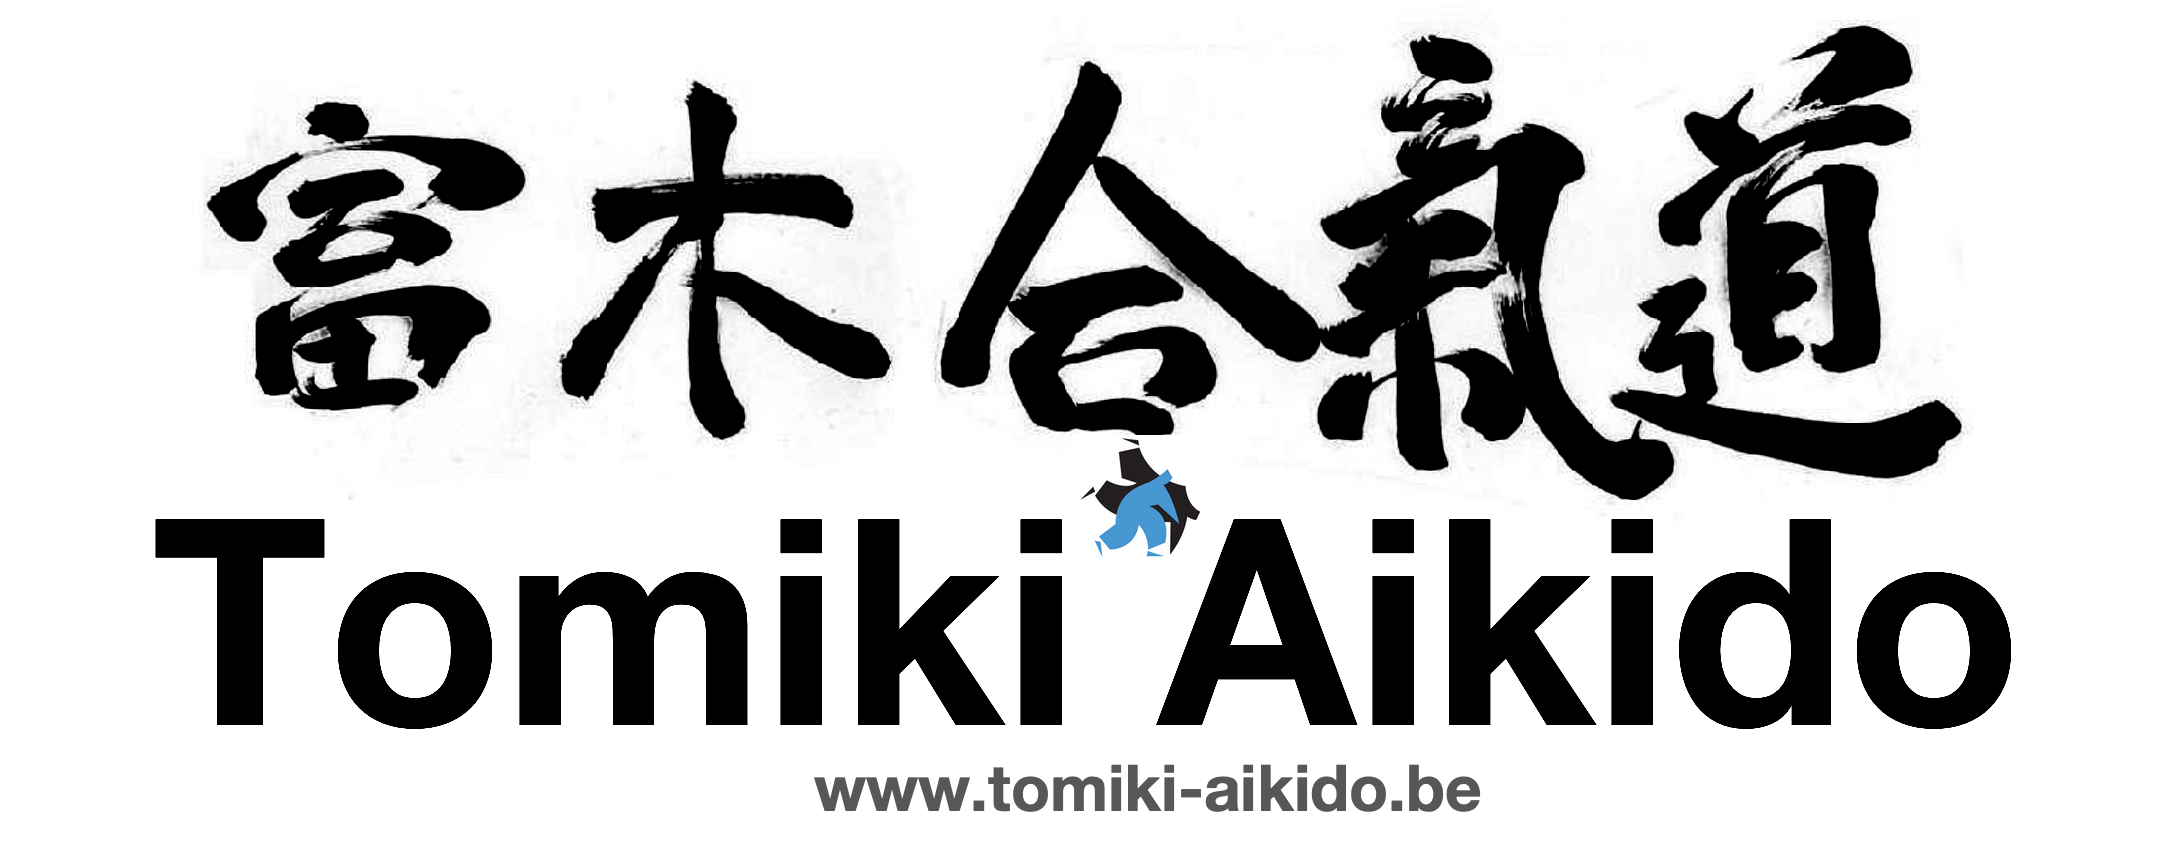 Tomiki Aikido Kanji